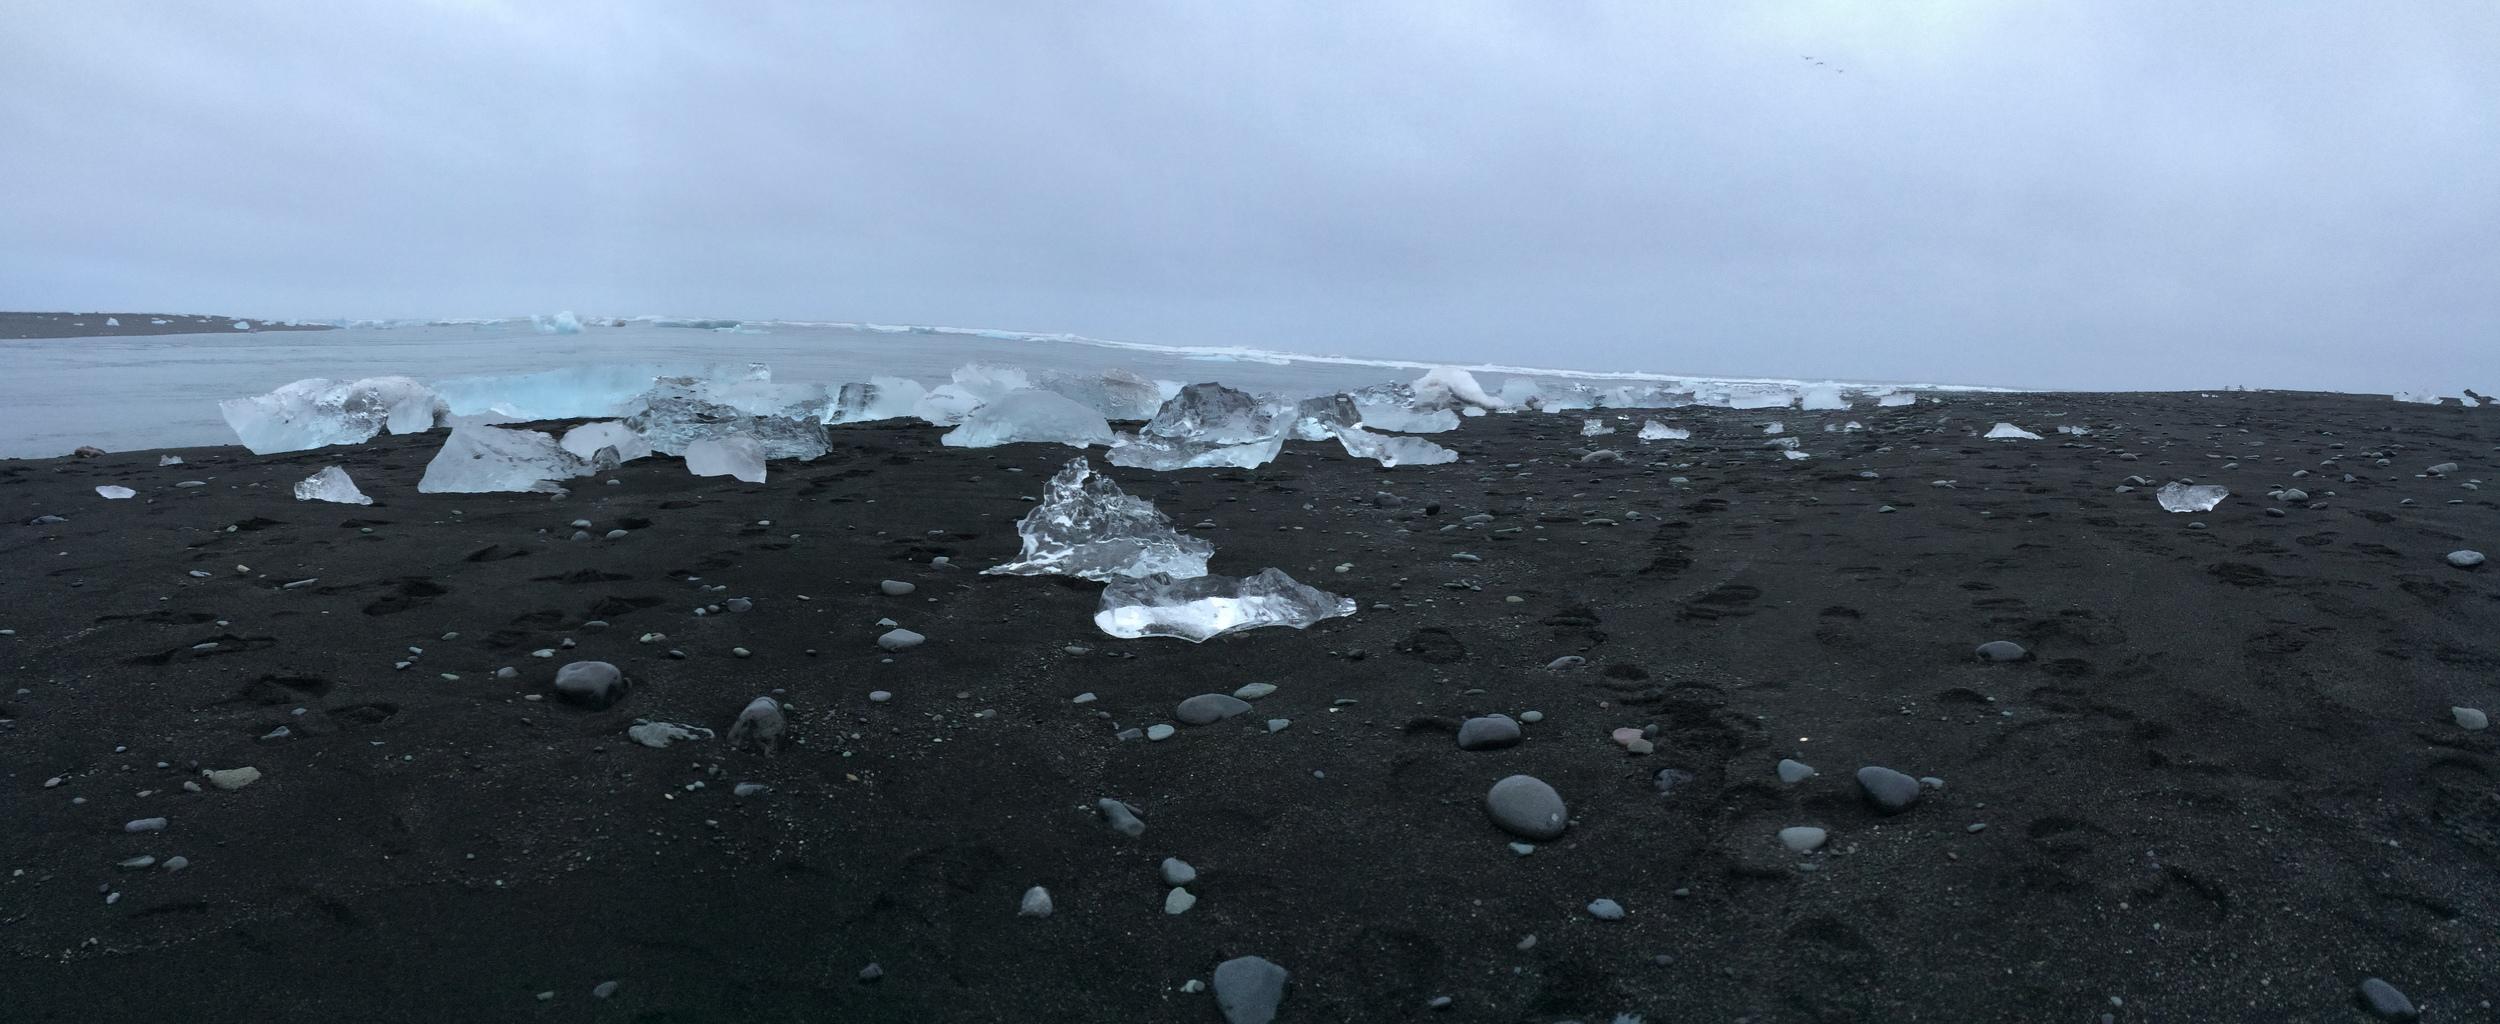 Icebergs, beach near Jokulsarlon Glacial Lagoon